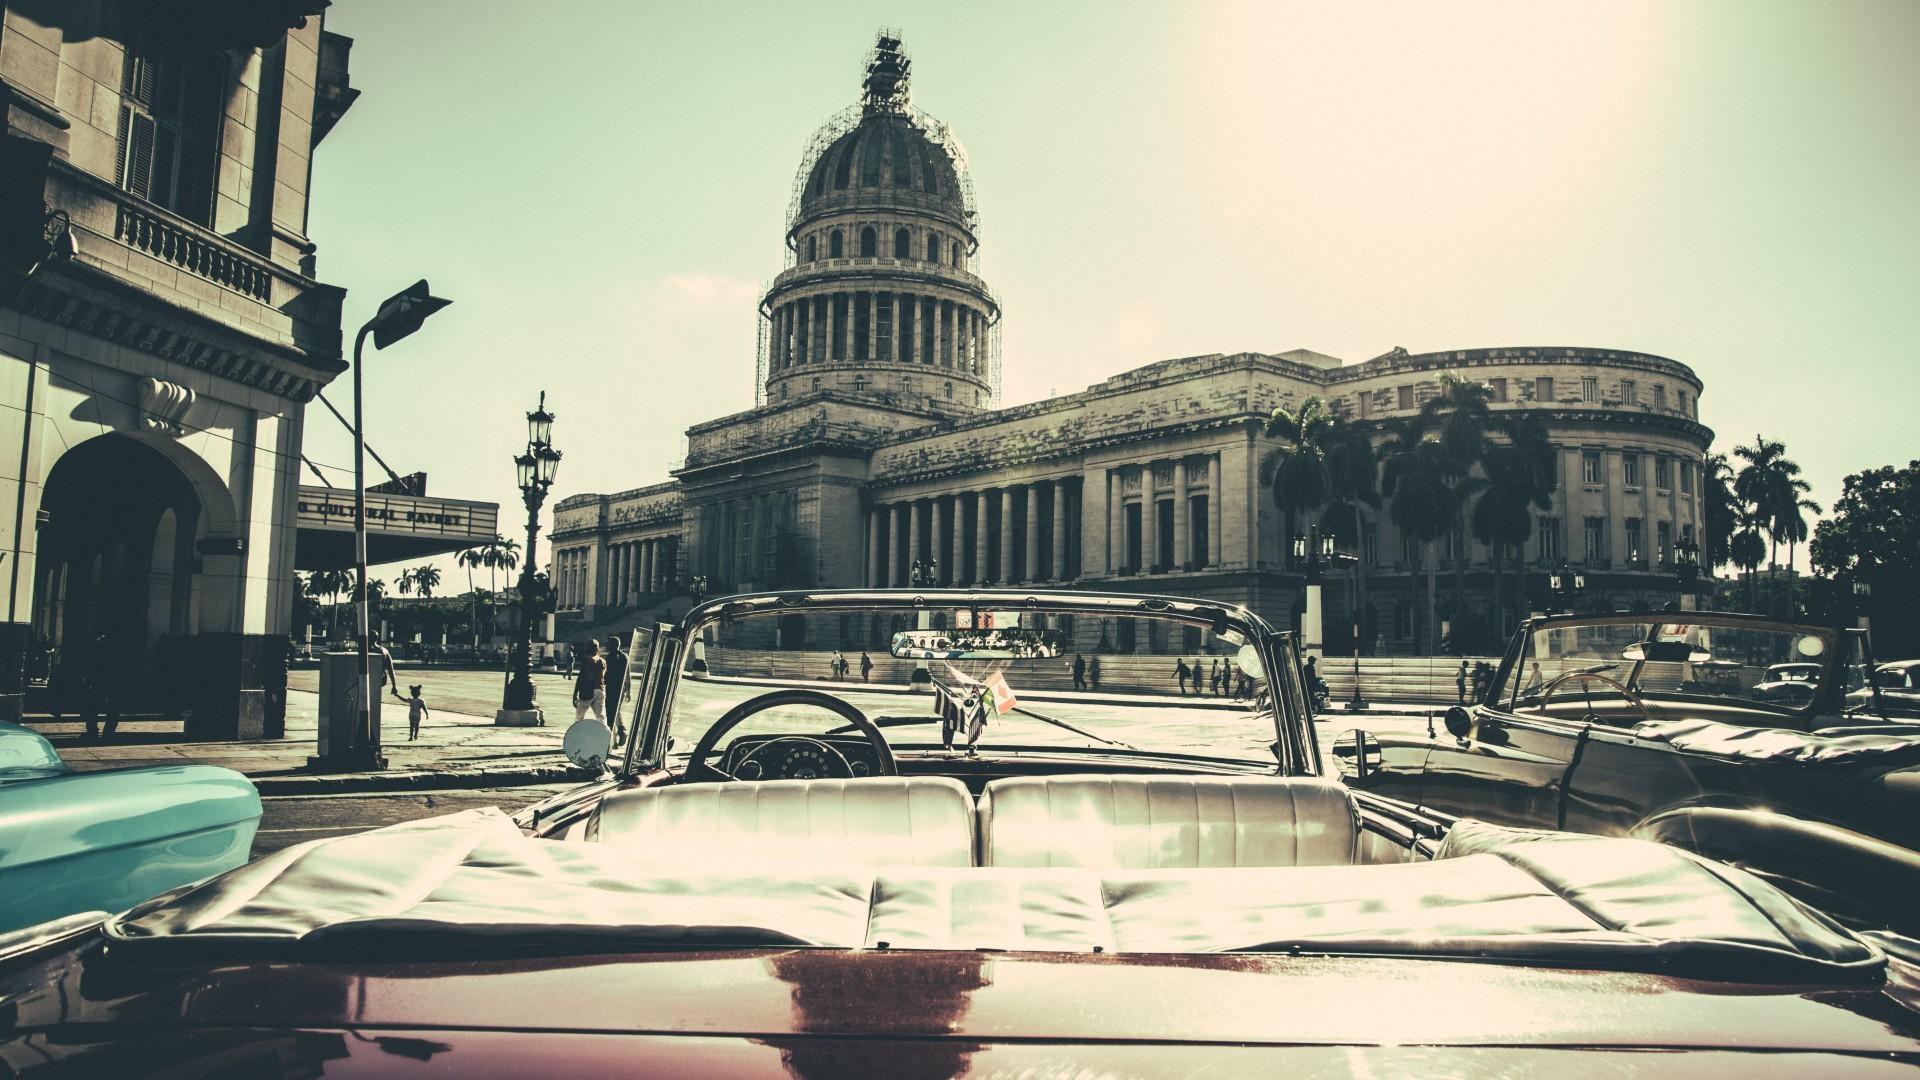 Cuba Pictures Wallpaper Backgrounds 66 Images